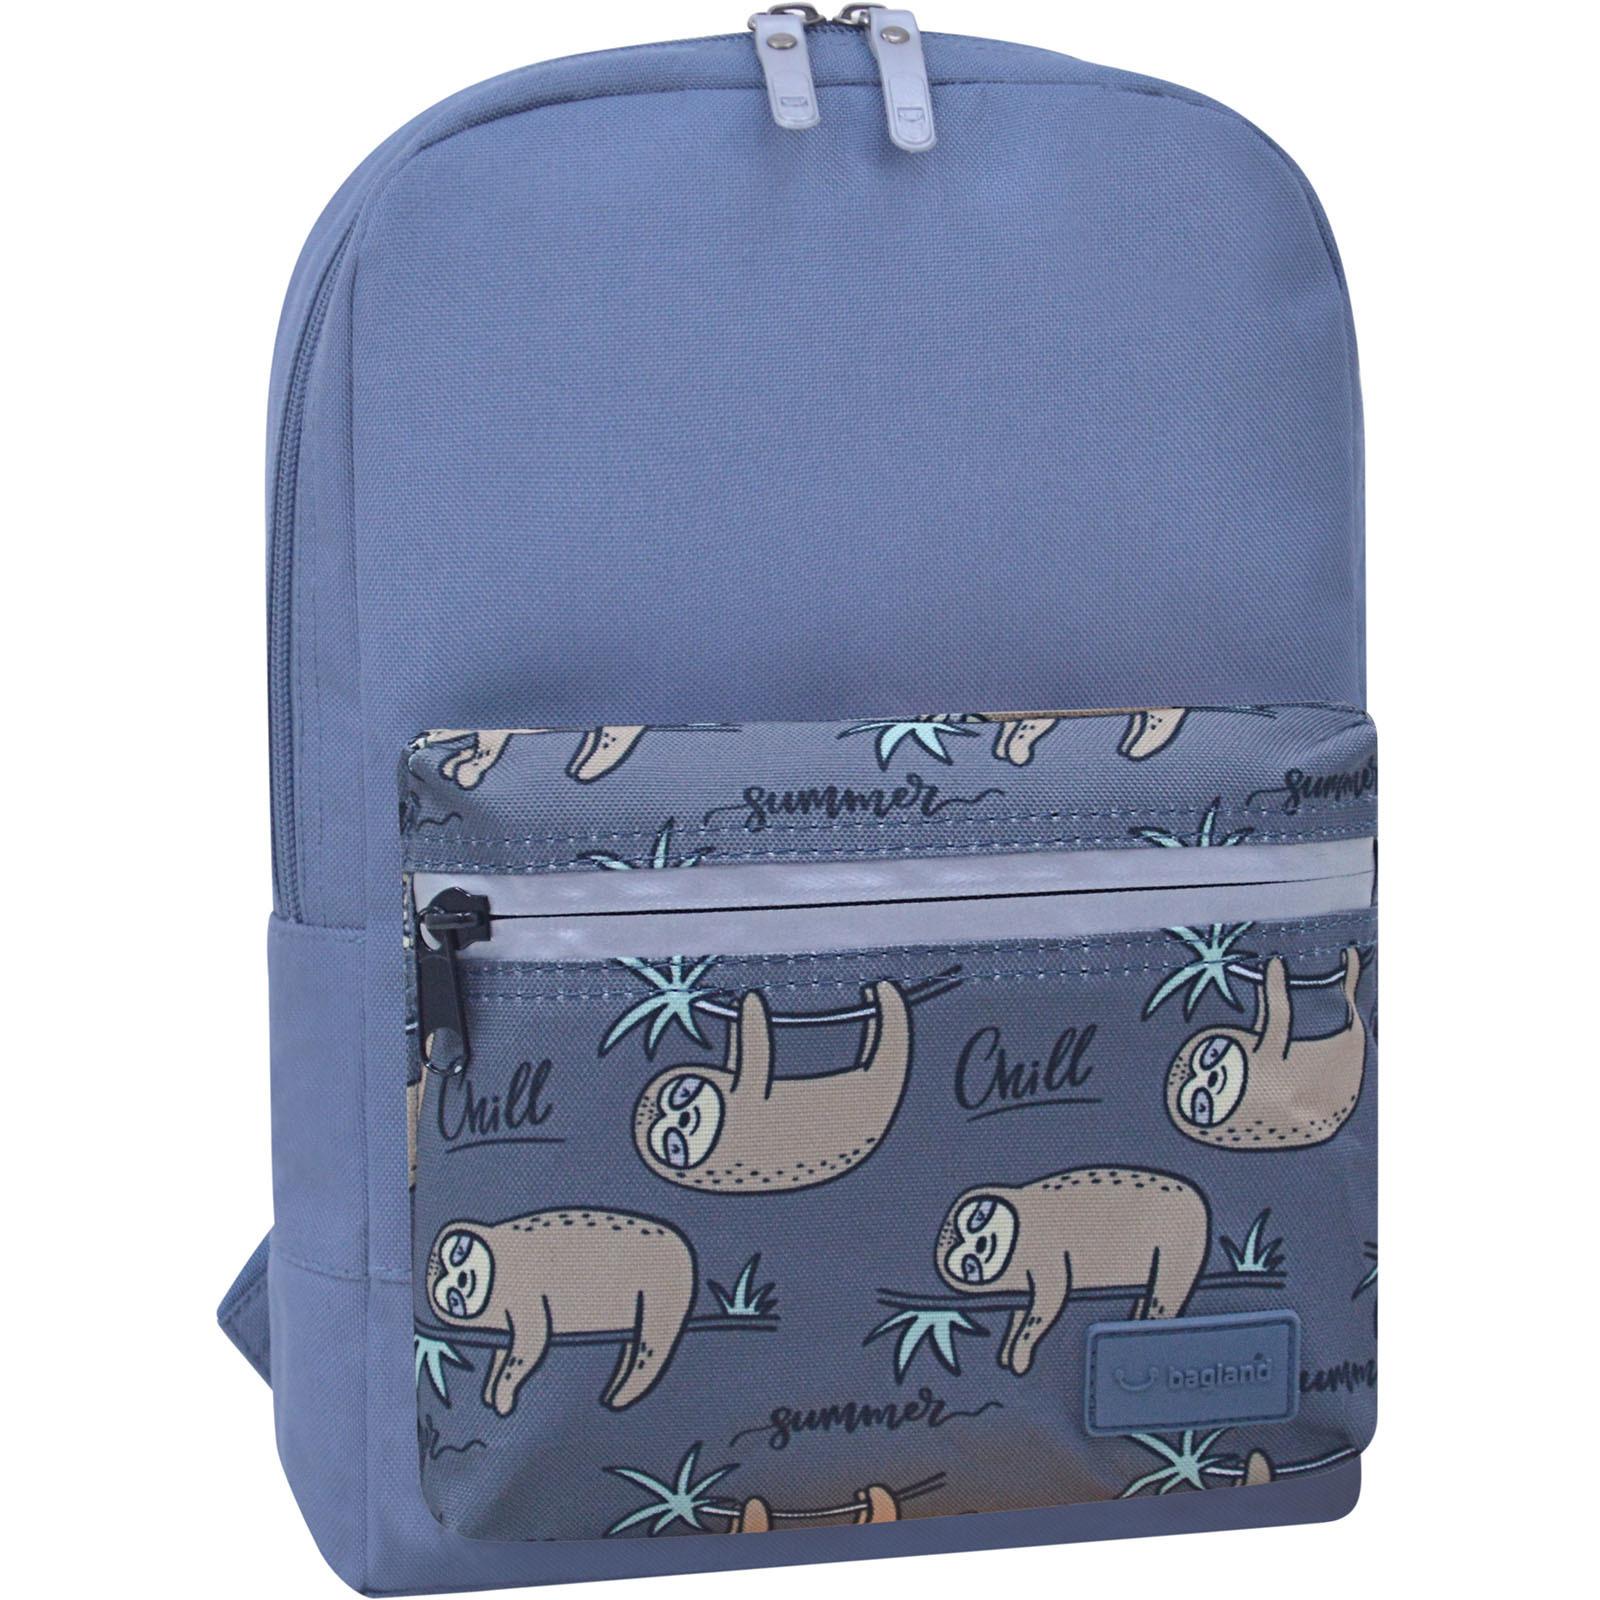 Молодежные рюкзаки Рюкзак Bagland Молодежный mini 8 л. серый 769 (0050866) DSC_1150_суб769_-1600.jpg